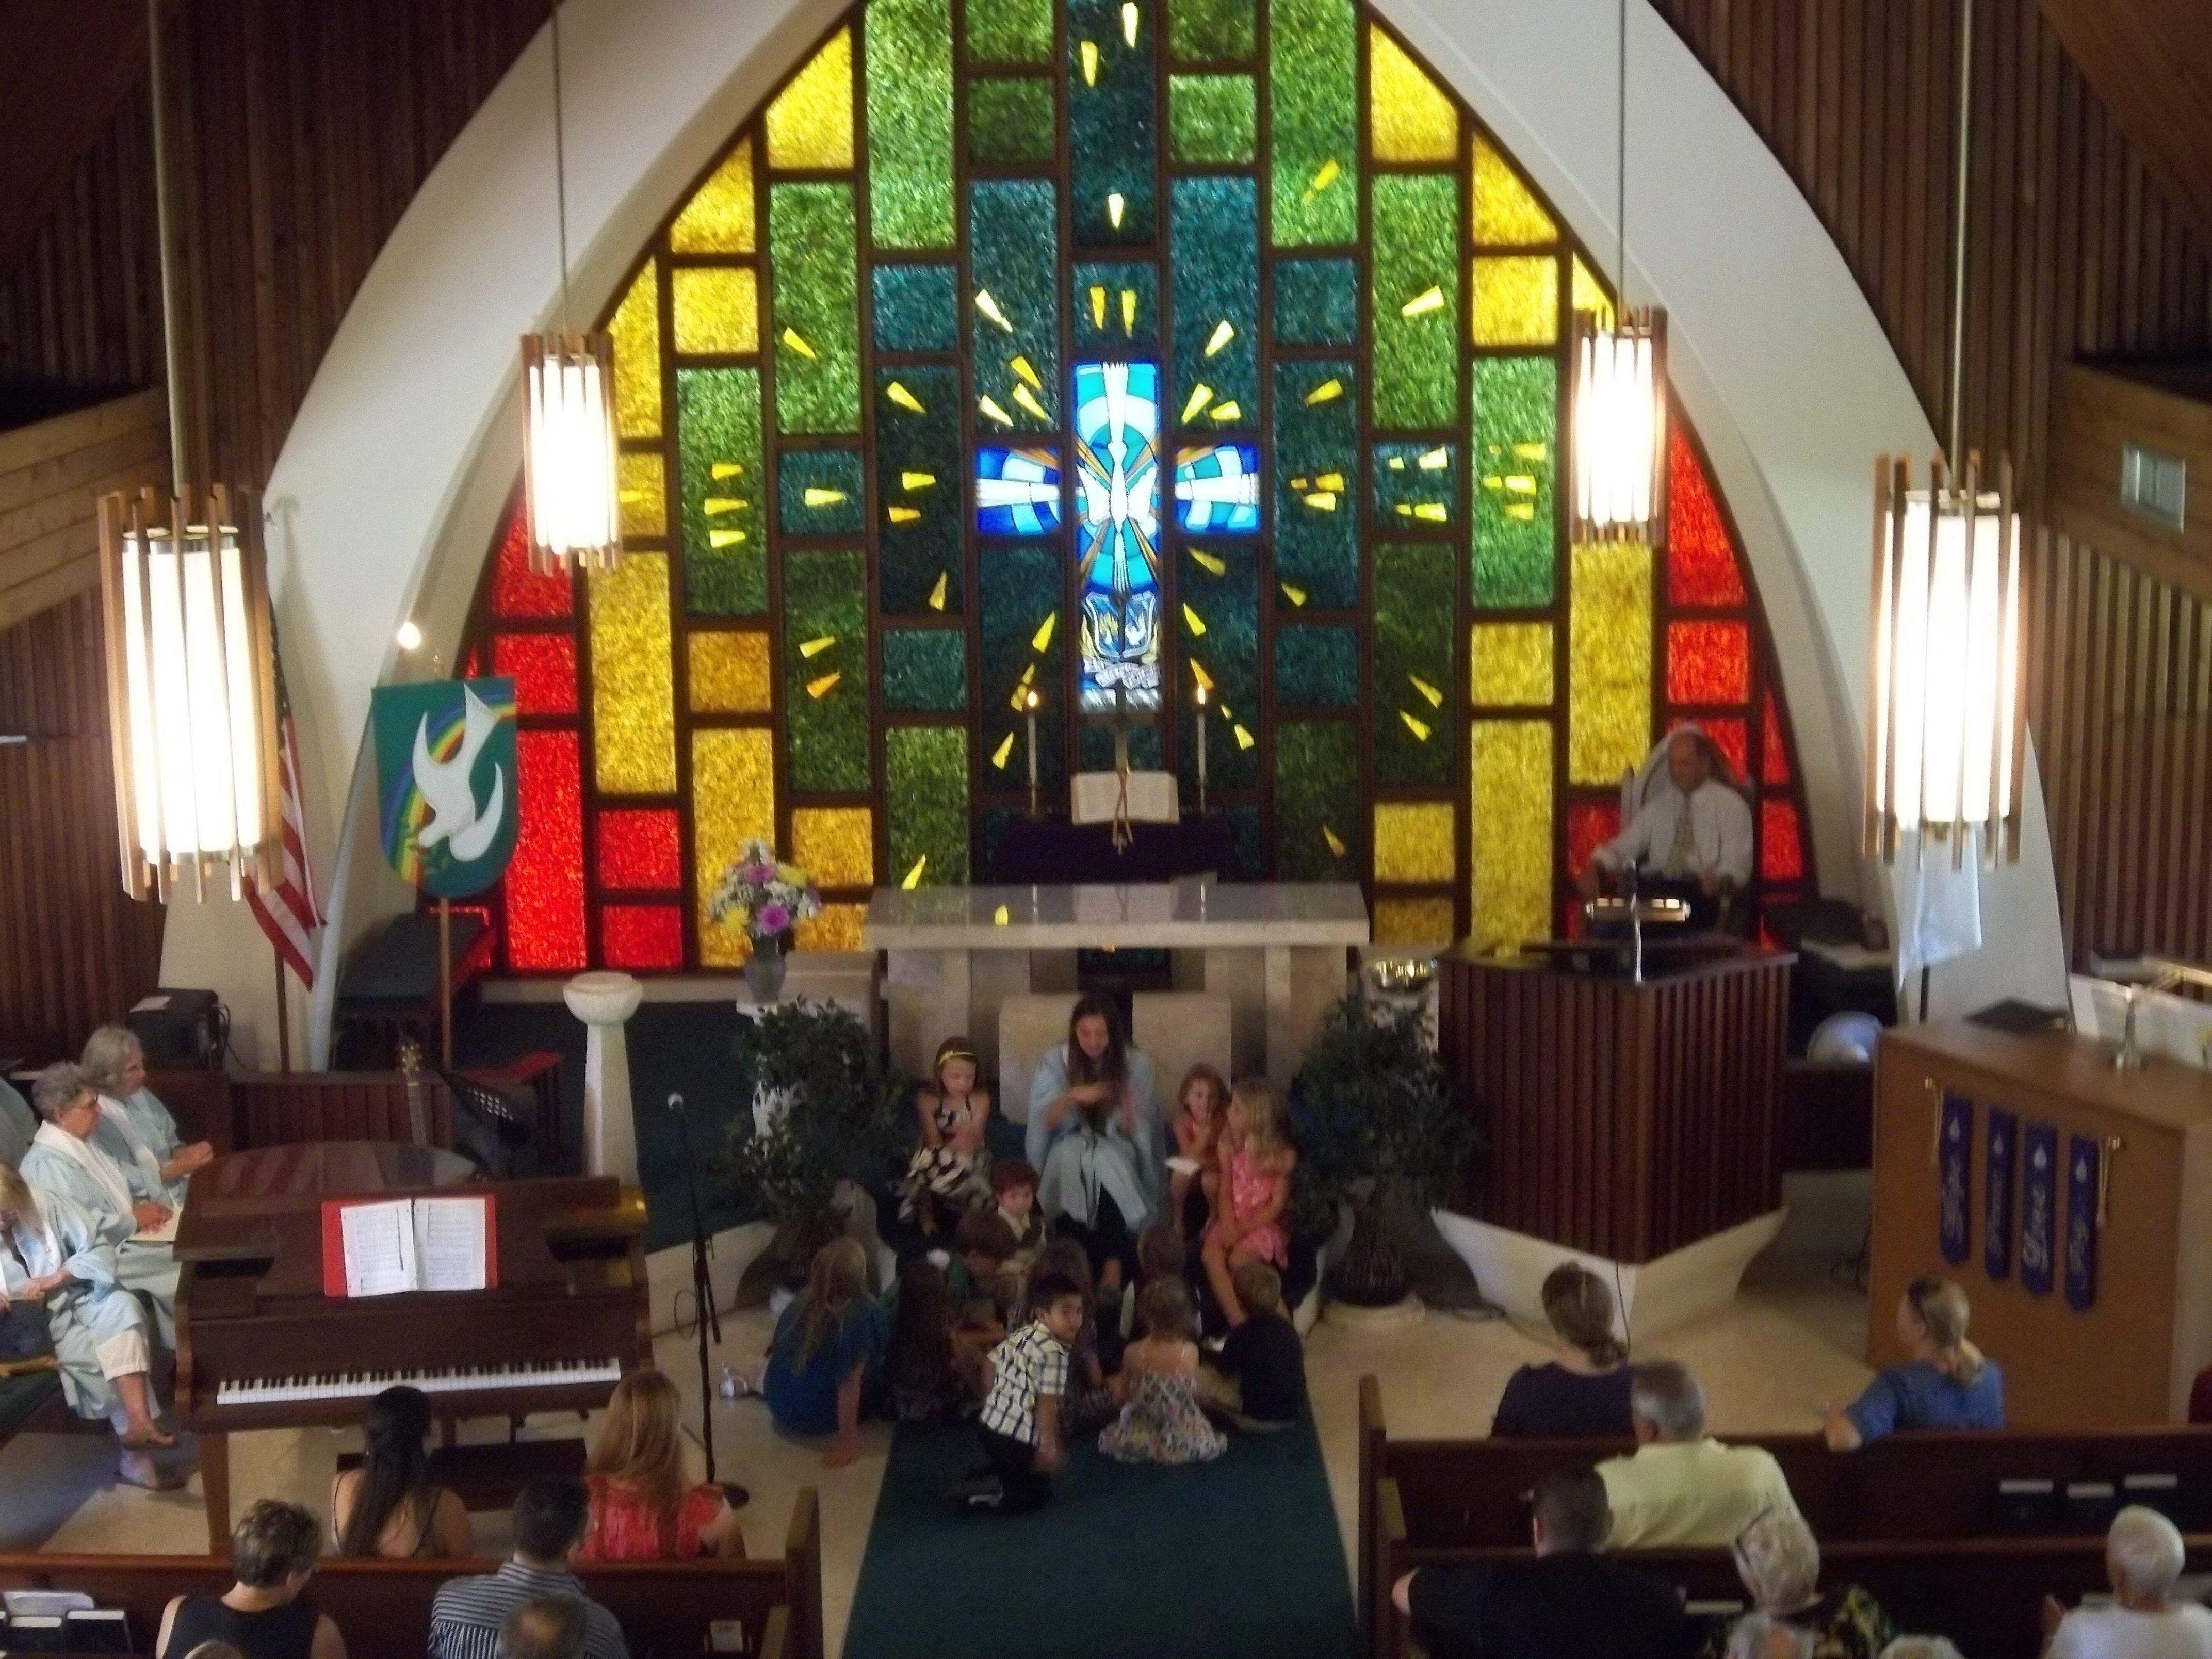 Cayleigh Lutz gives Childrens Sermon